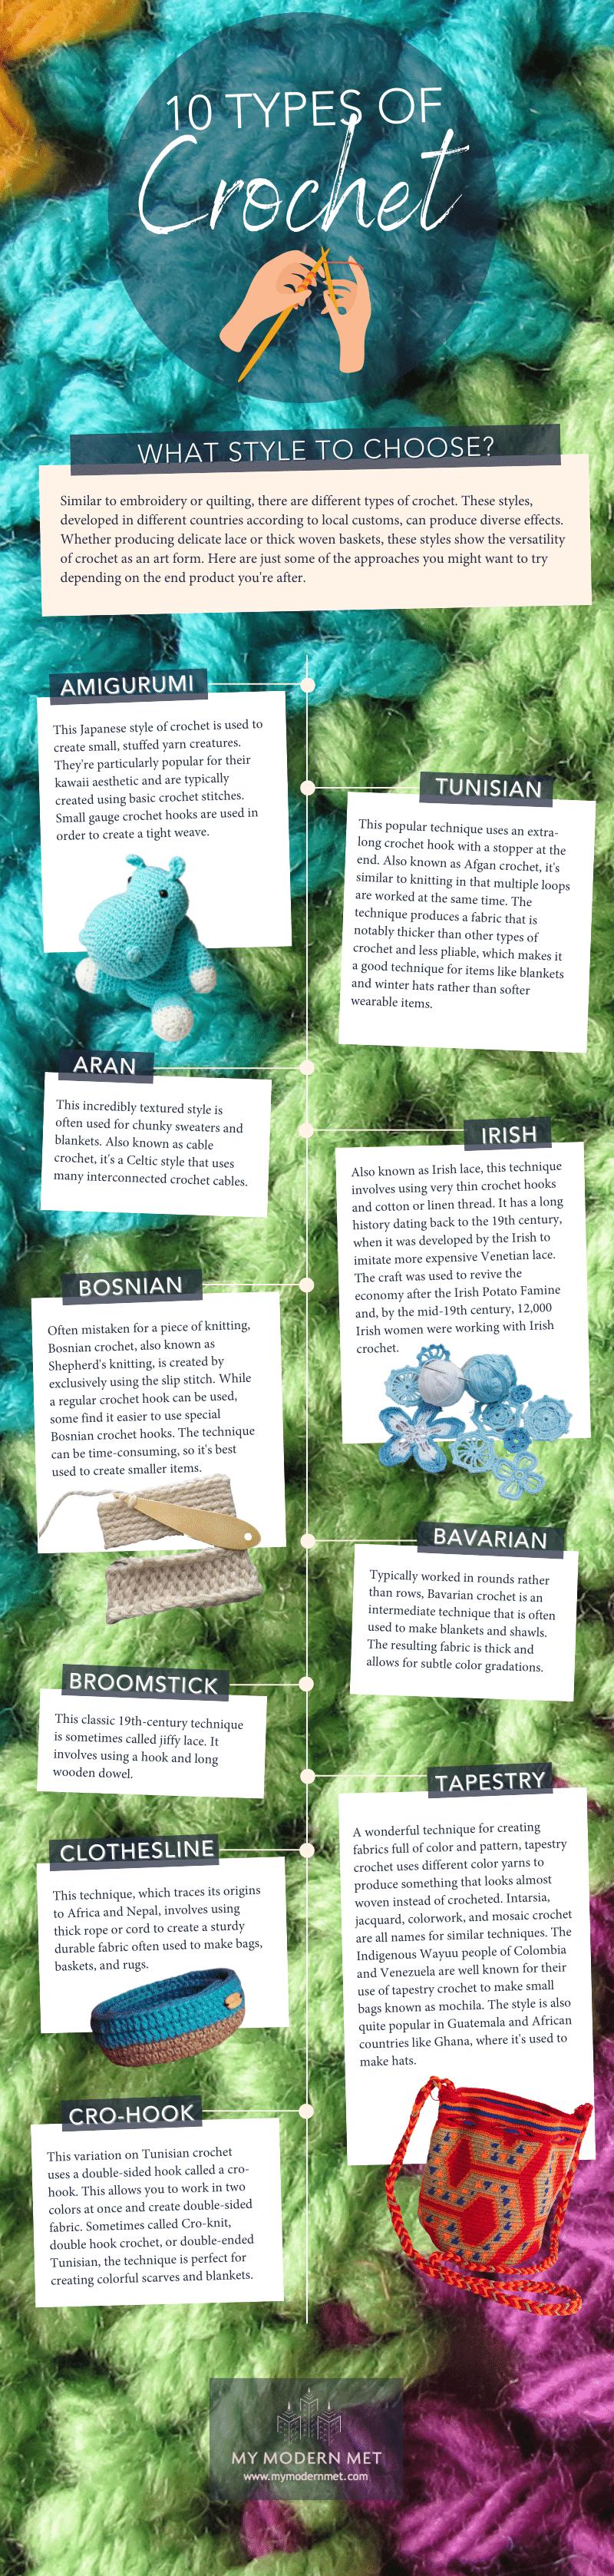 Types of Crochet Infographic